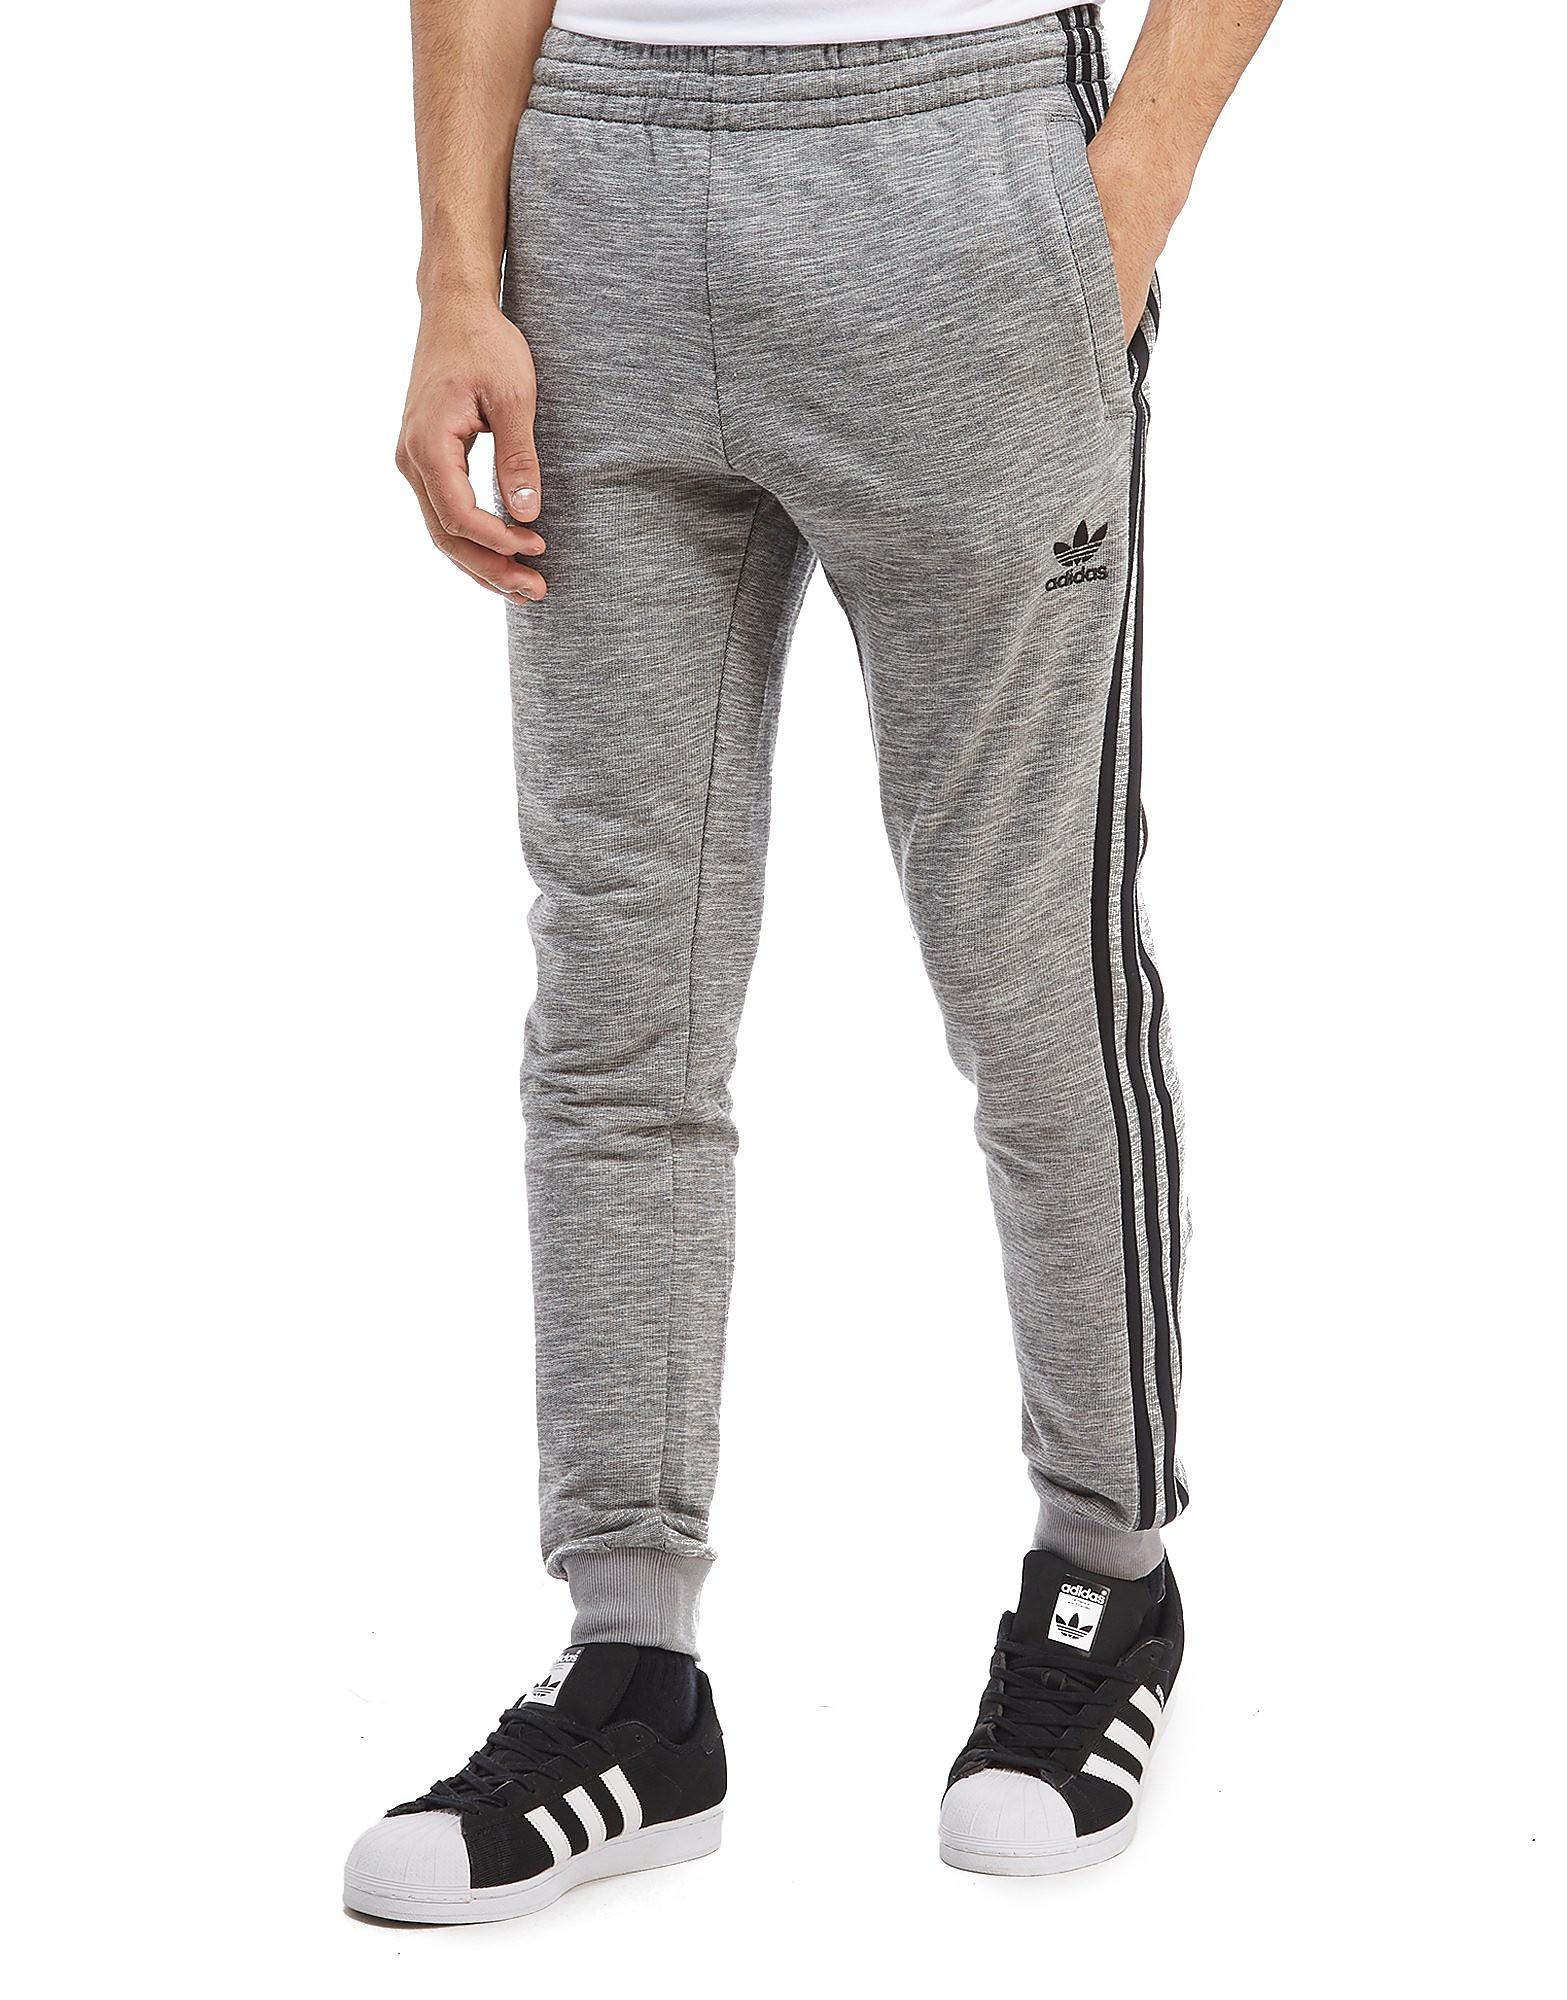 adidas Originals Superstar Strick Trainingshosen